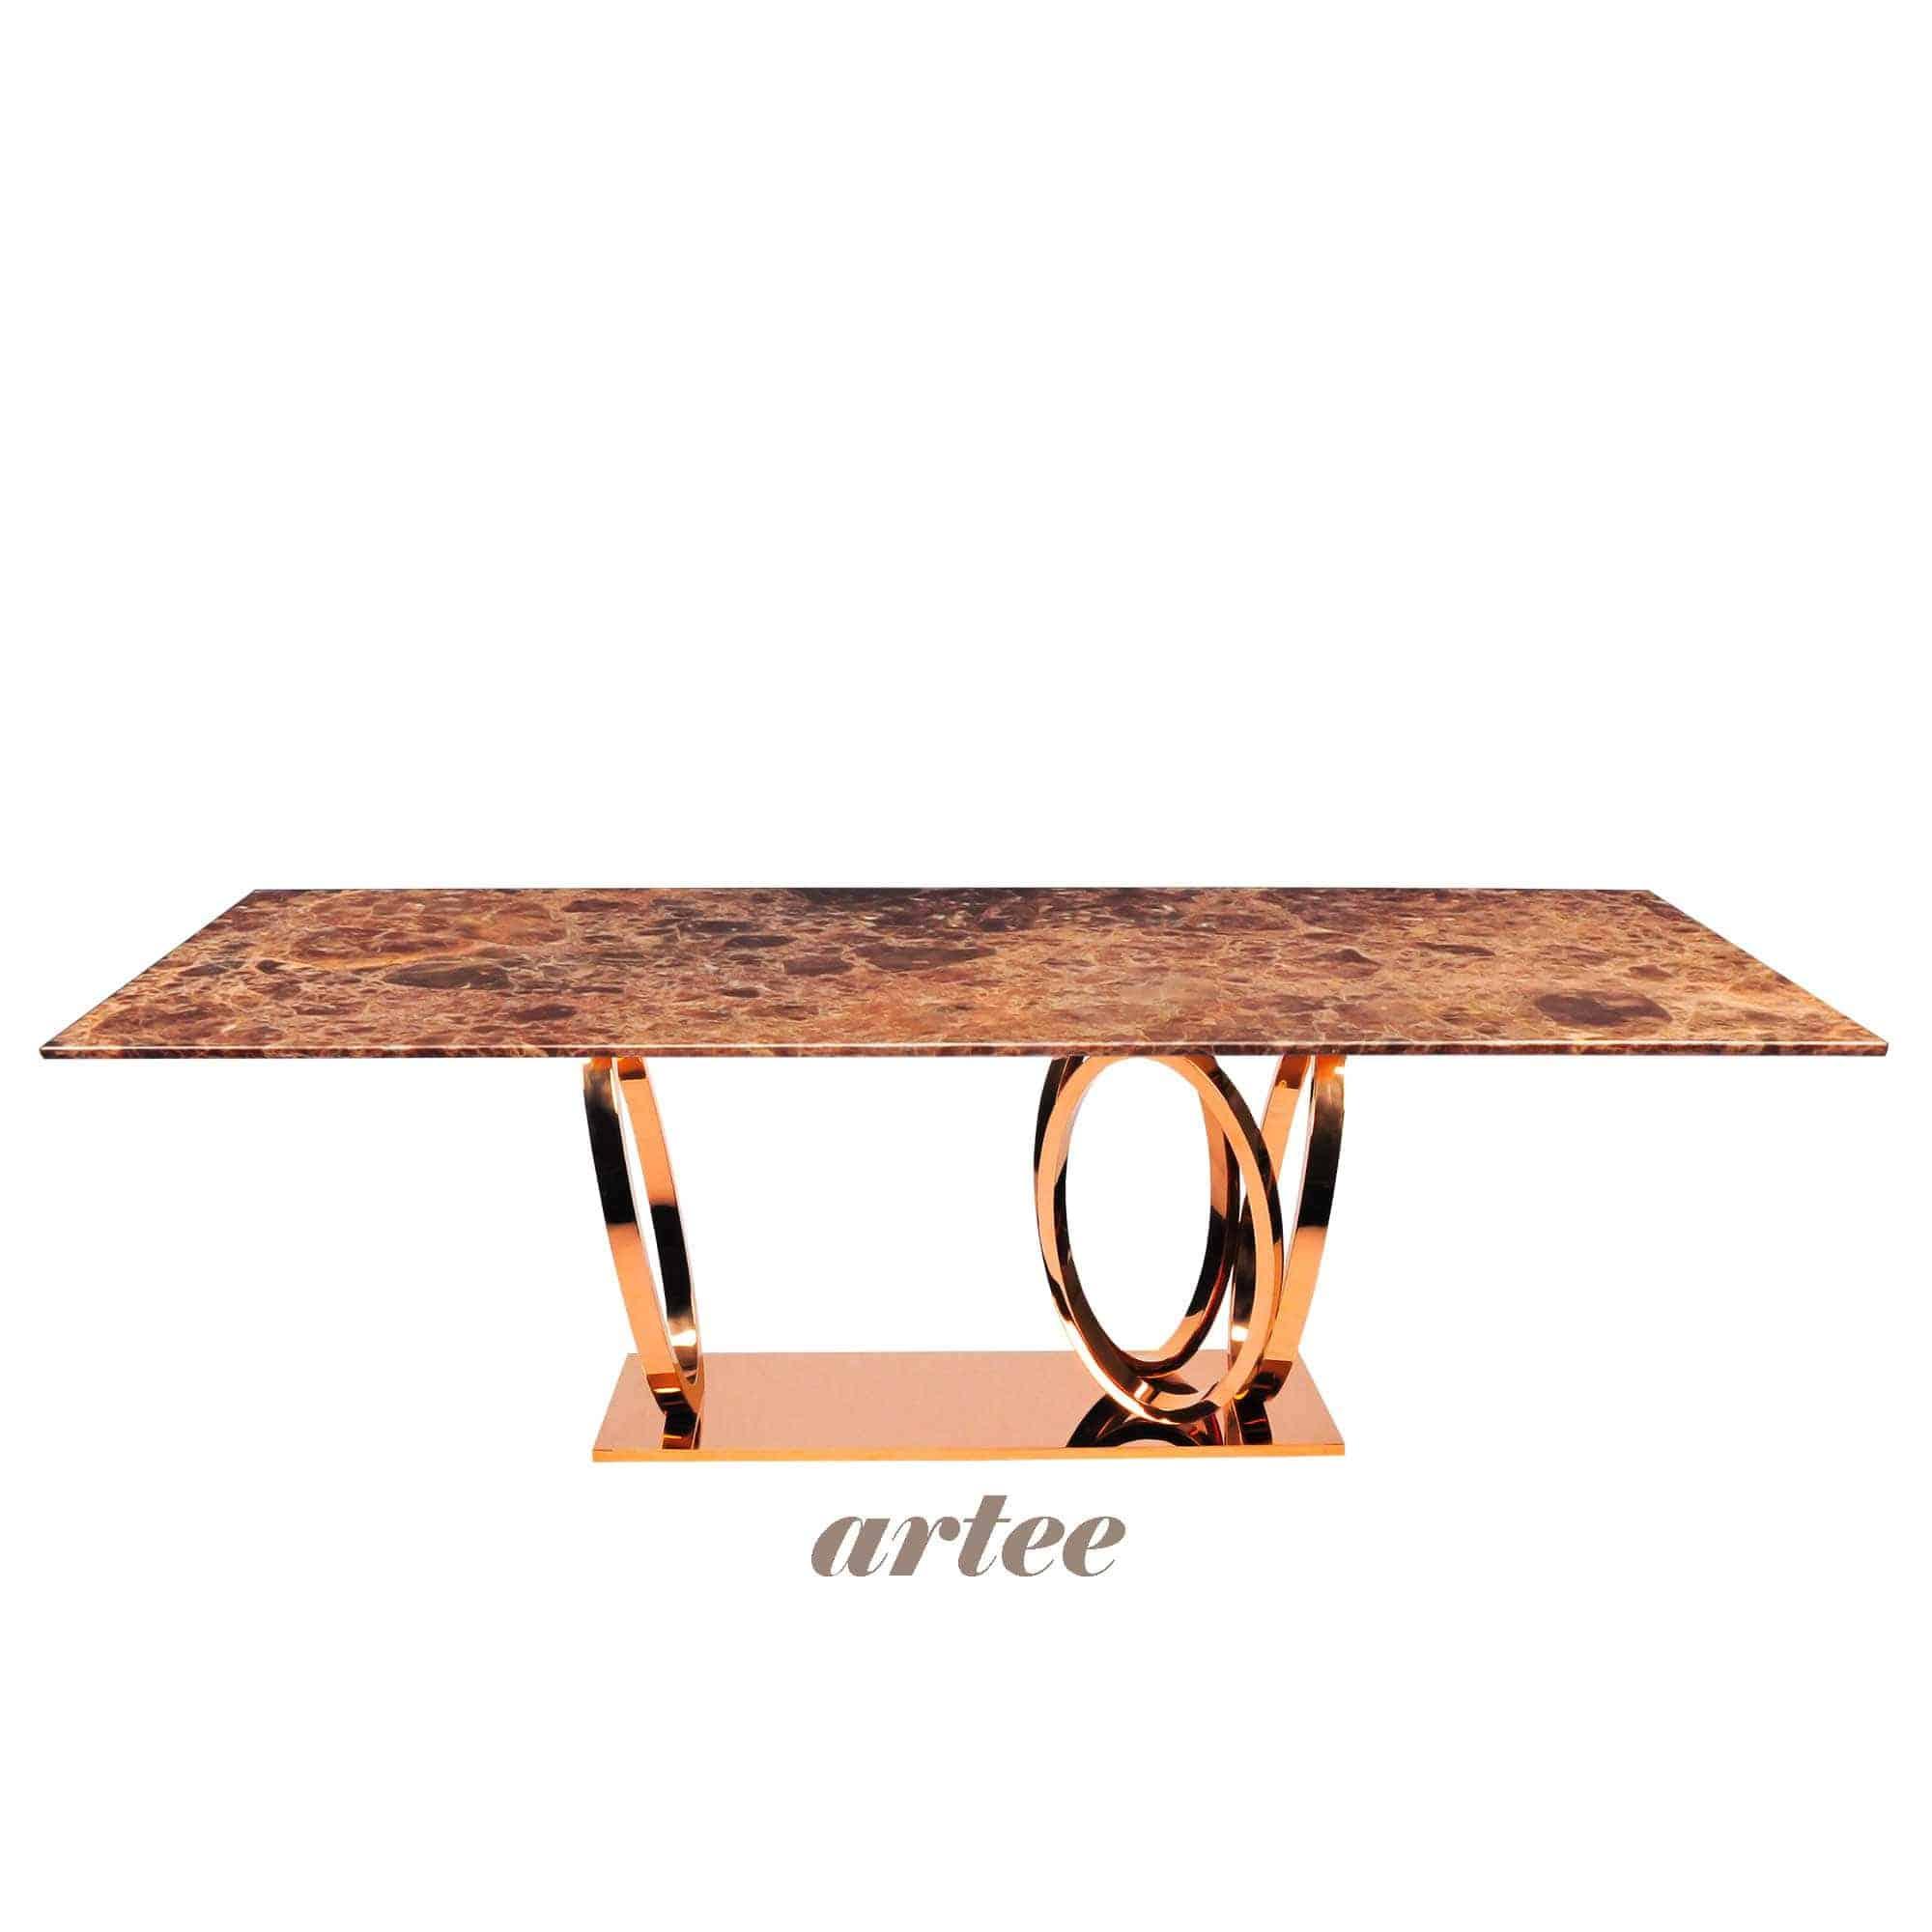 dark-emperador-dark-brown-rectangular-marble-dining-table-8-to-10-pax-decasa-marble-2400x1100mm-artee-rg